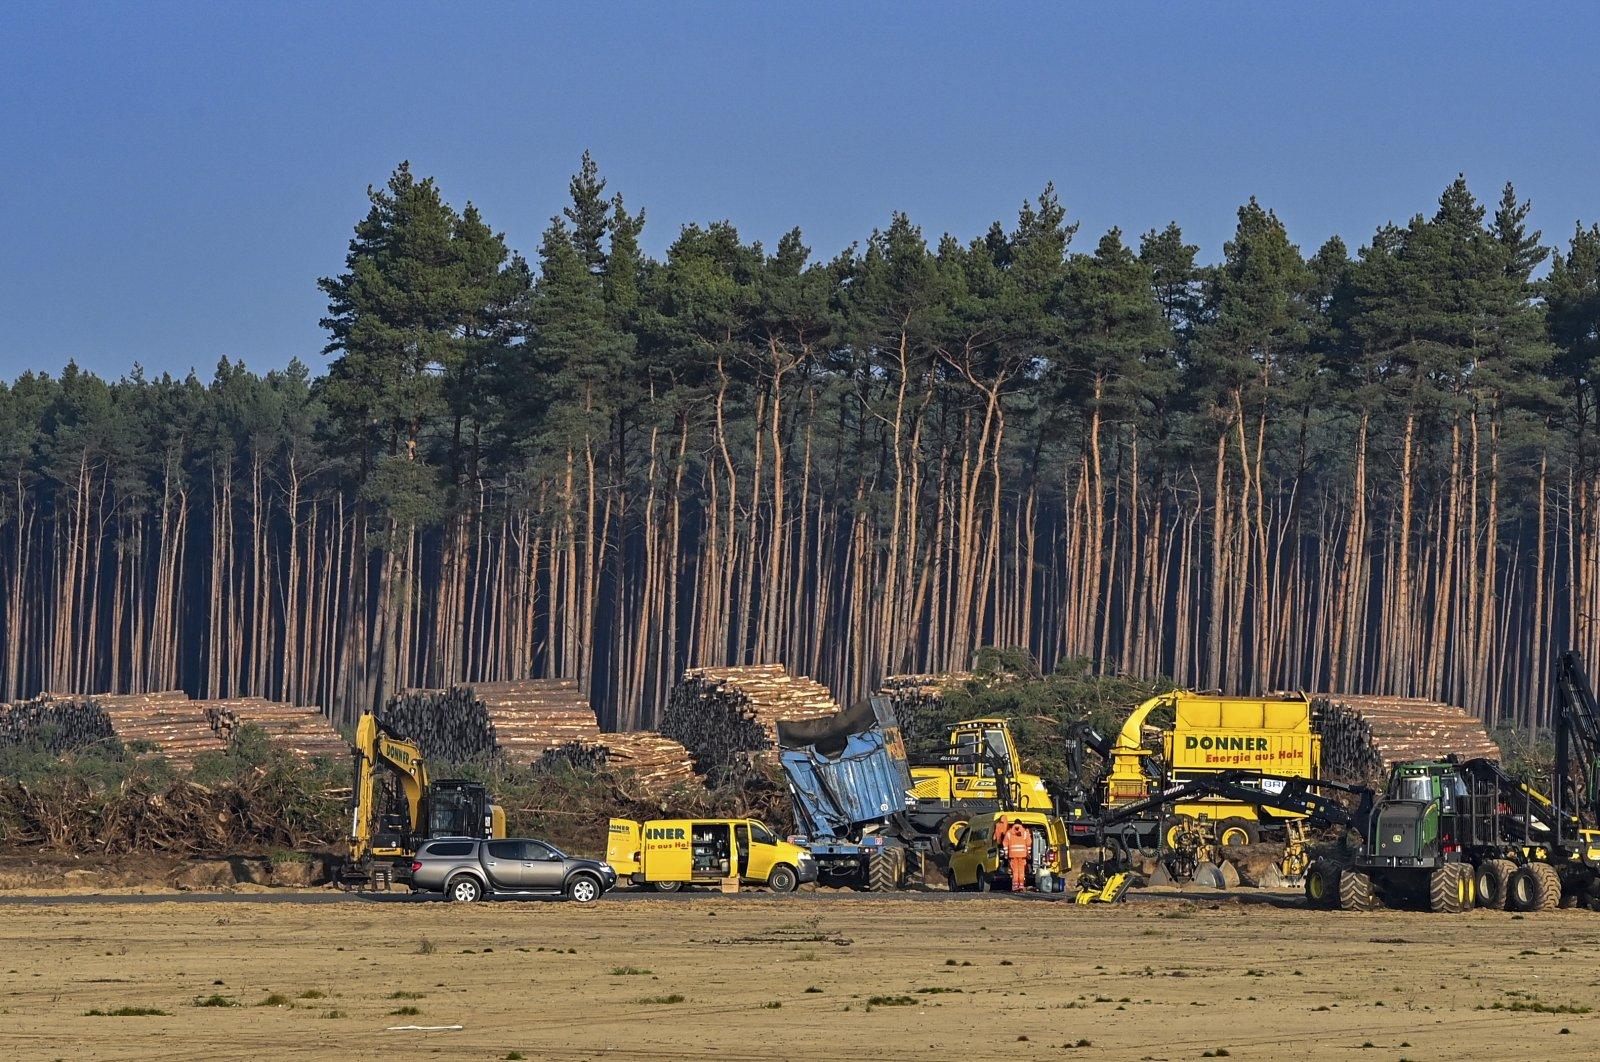 Trees on the construction site of the Tesla Gigafactory in Gruenheide near Berlin, Germany, Dec. 8, 2020. (AP Photo)